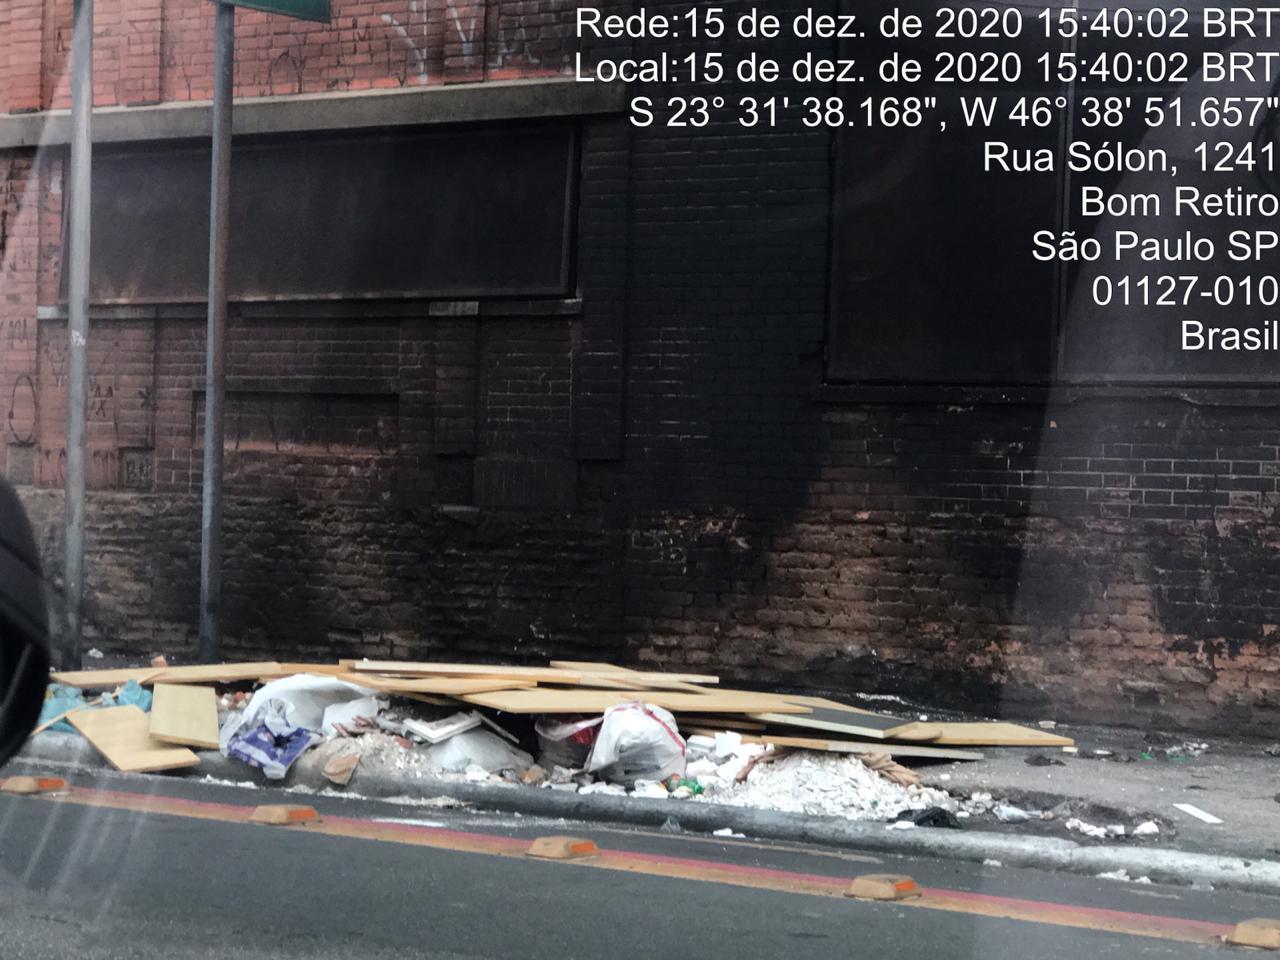 Rua Solon 1 Ajuda SP Centro